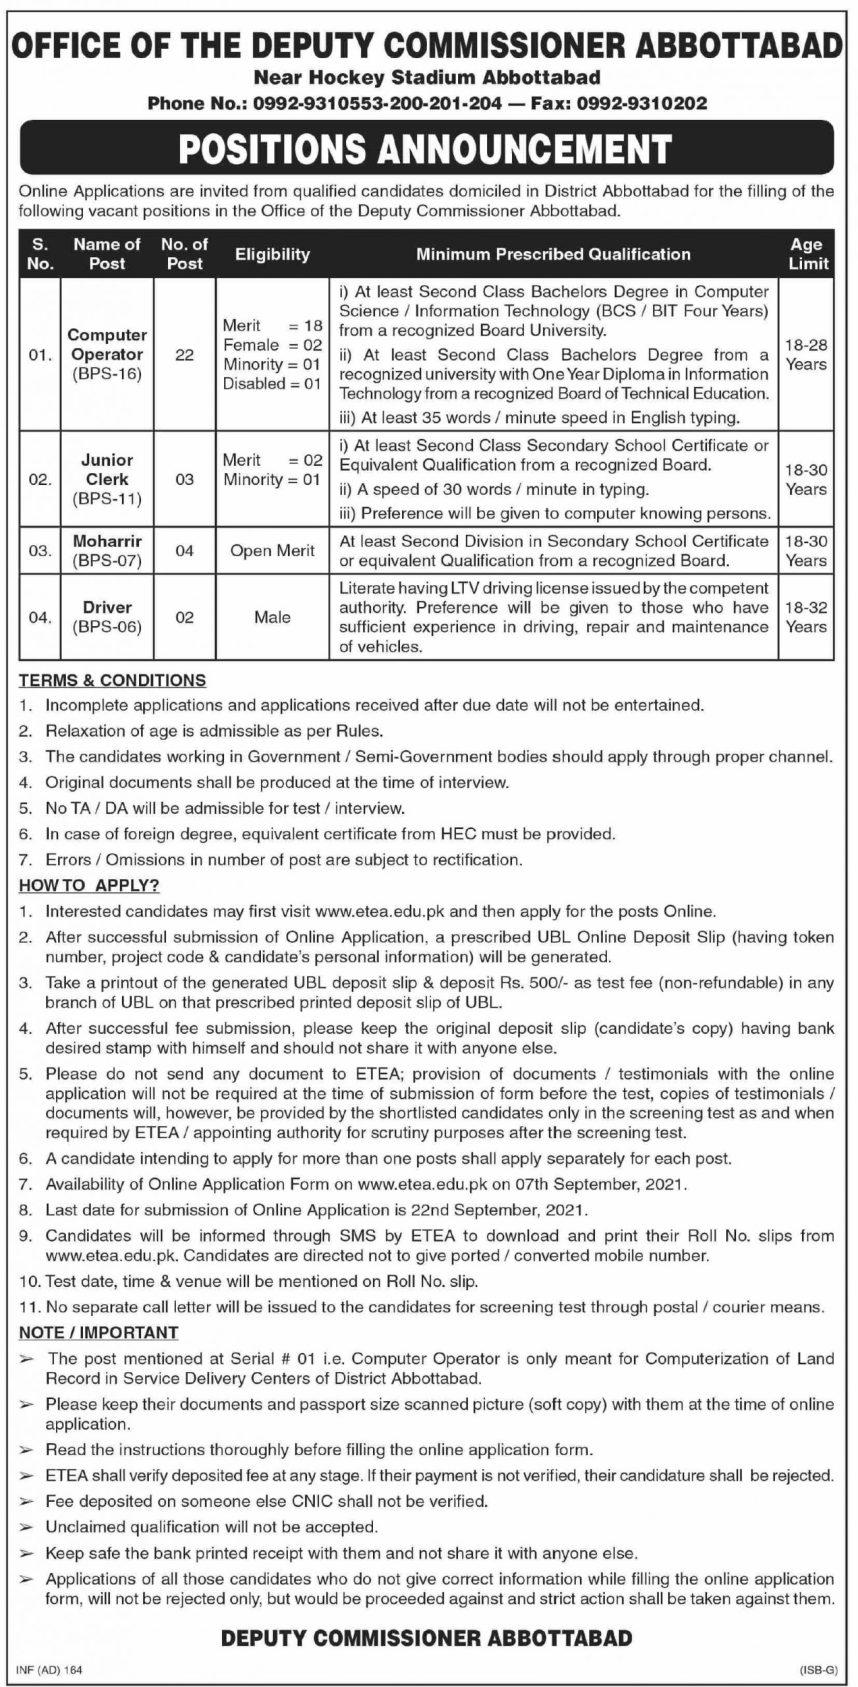 Deputy Commissioner Officer Abbottabad Jobs 2021